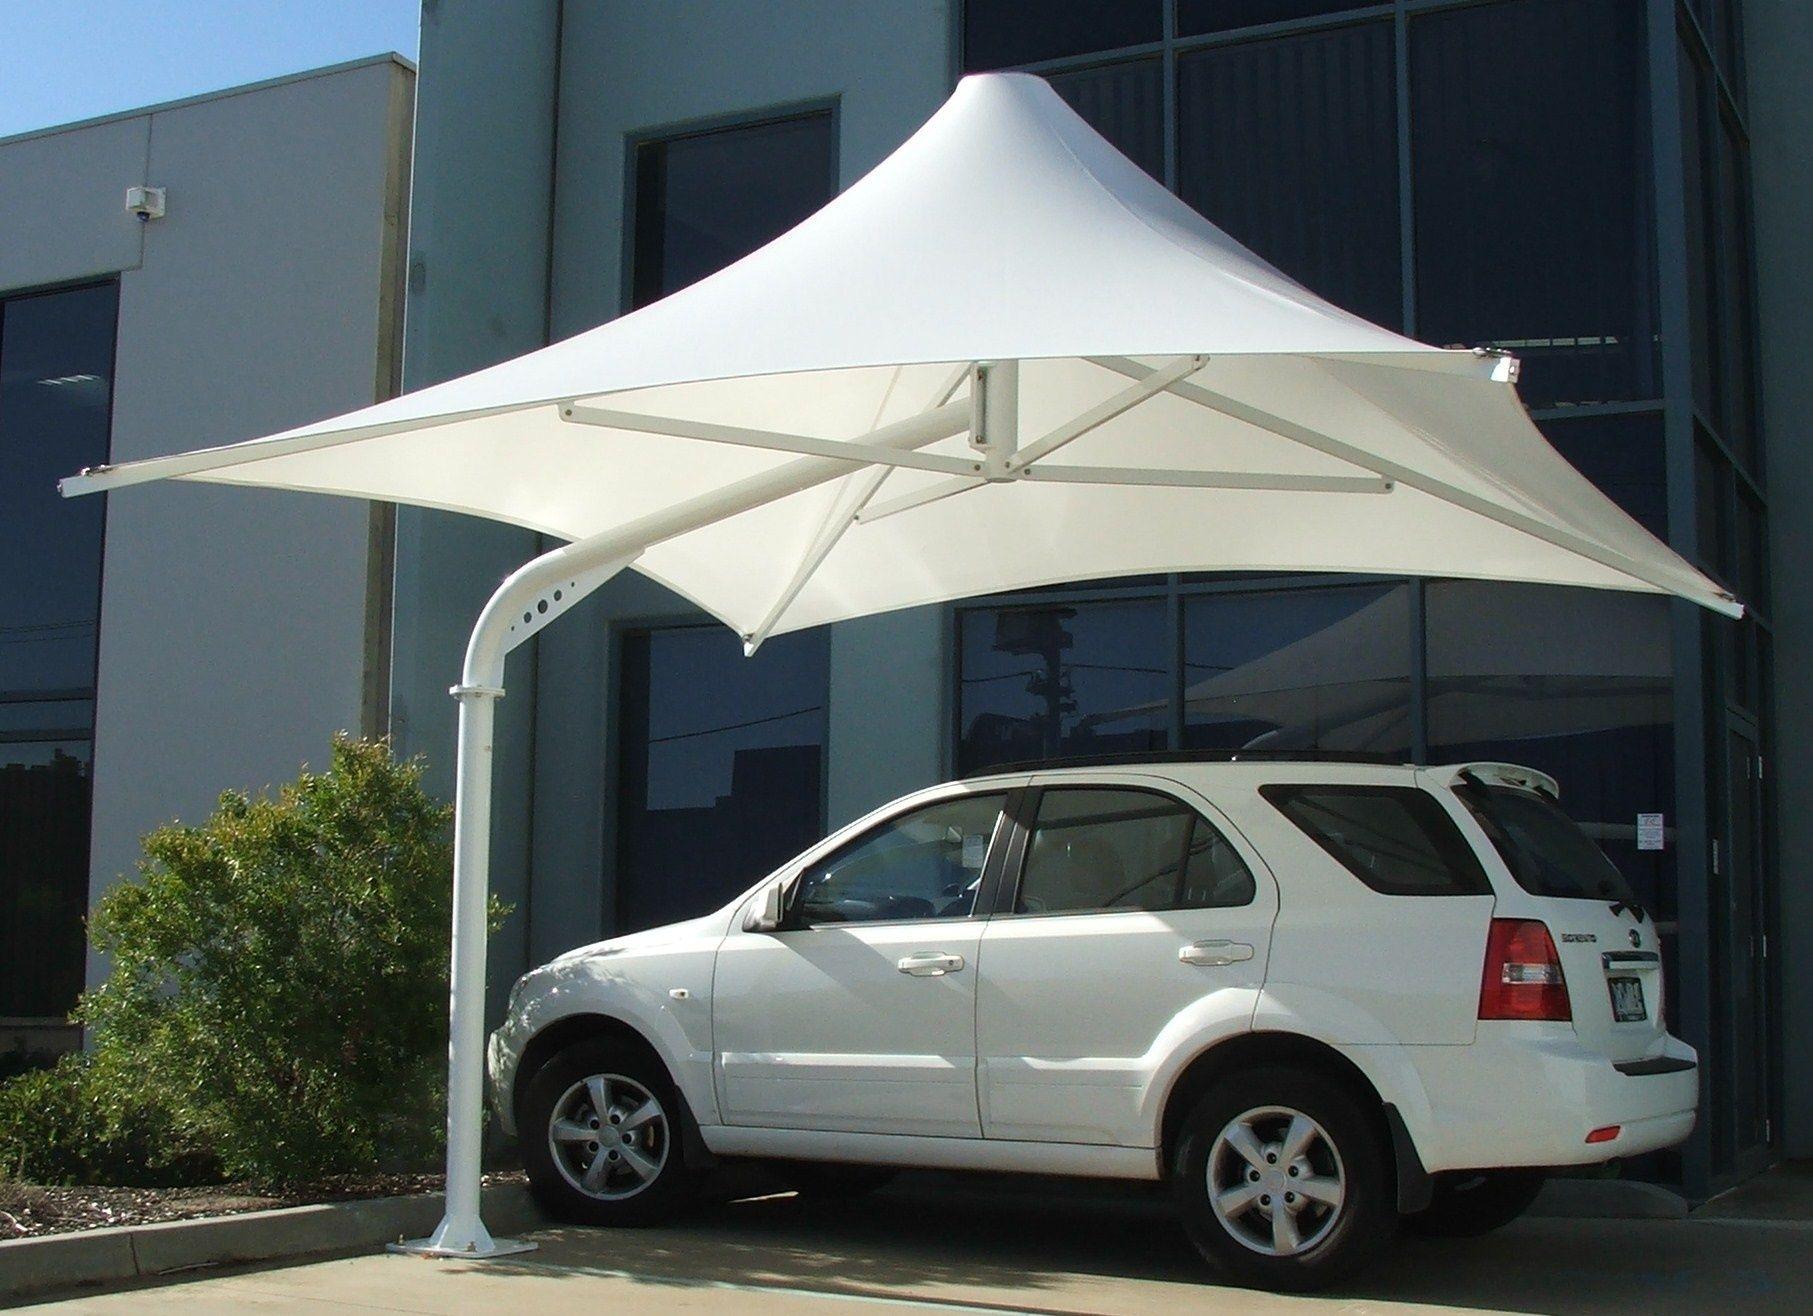 Carport Freestanding Lightweight Google Search Car Shade Car Shed Carport